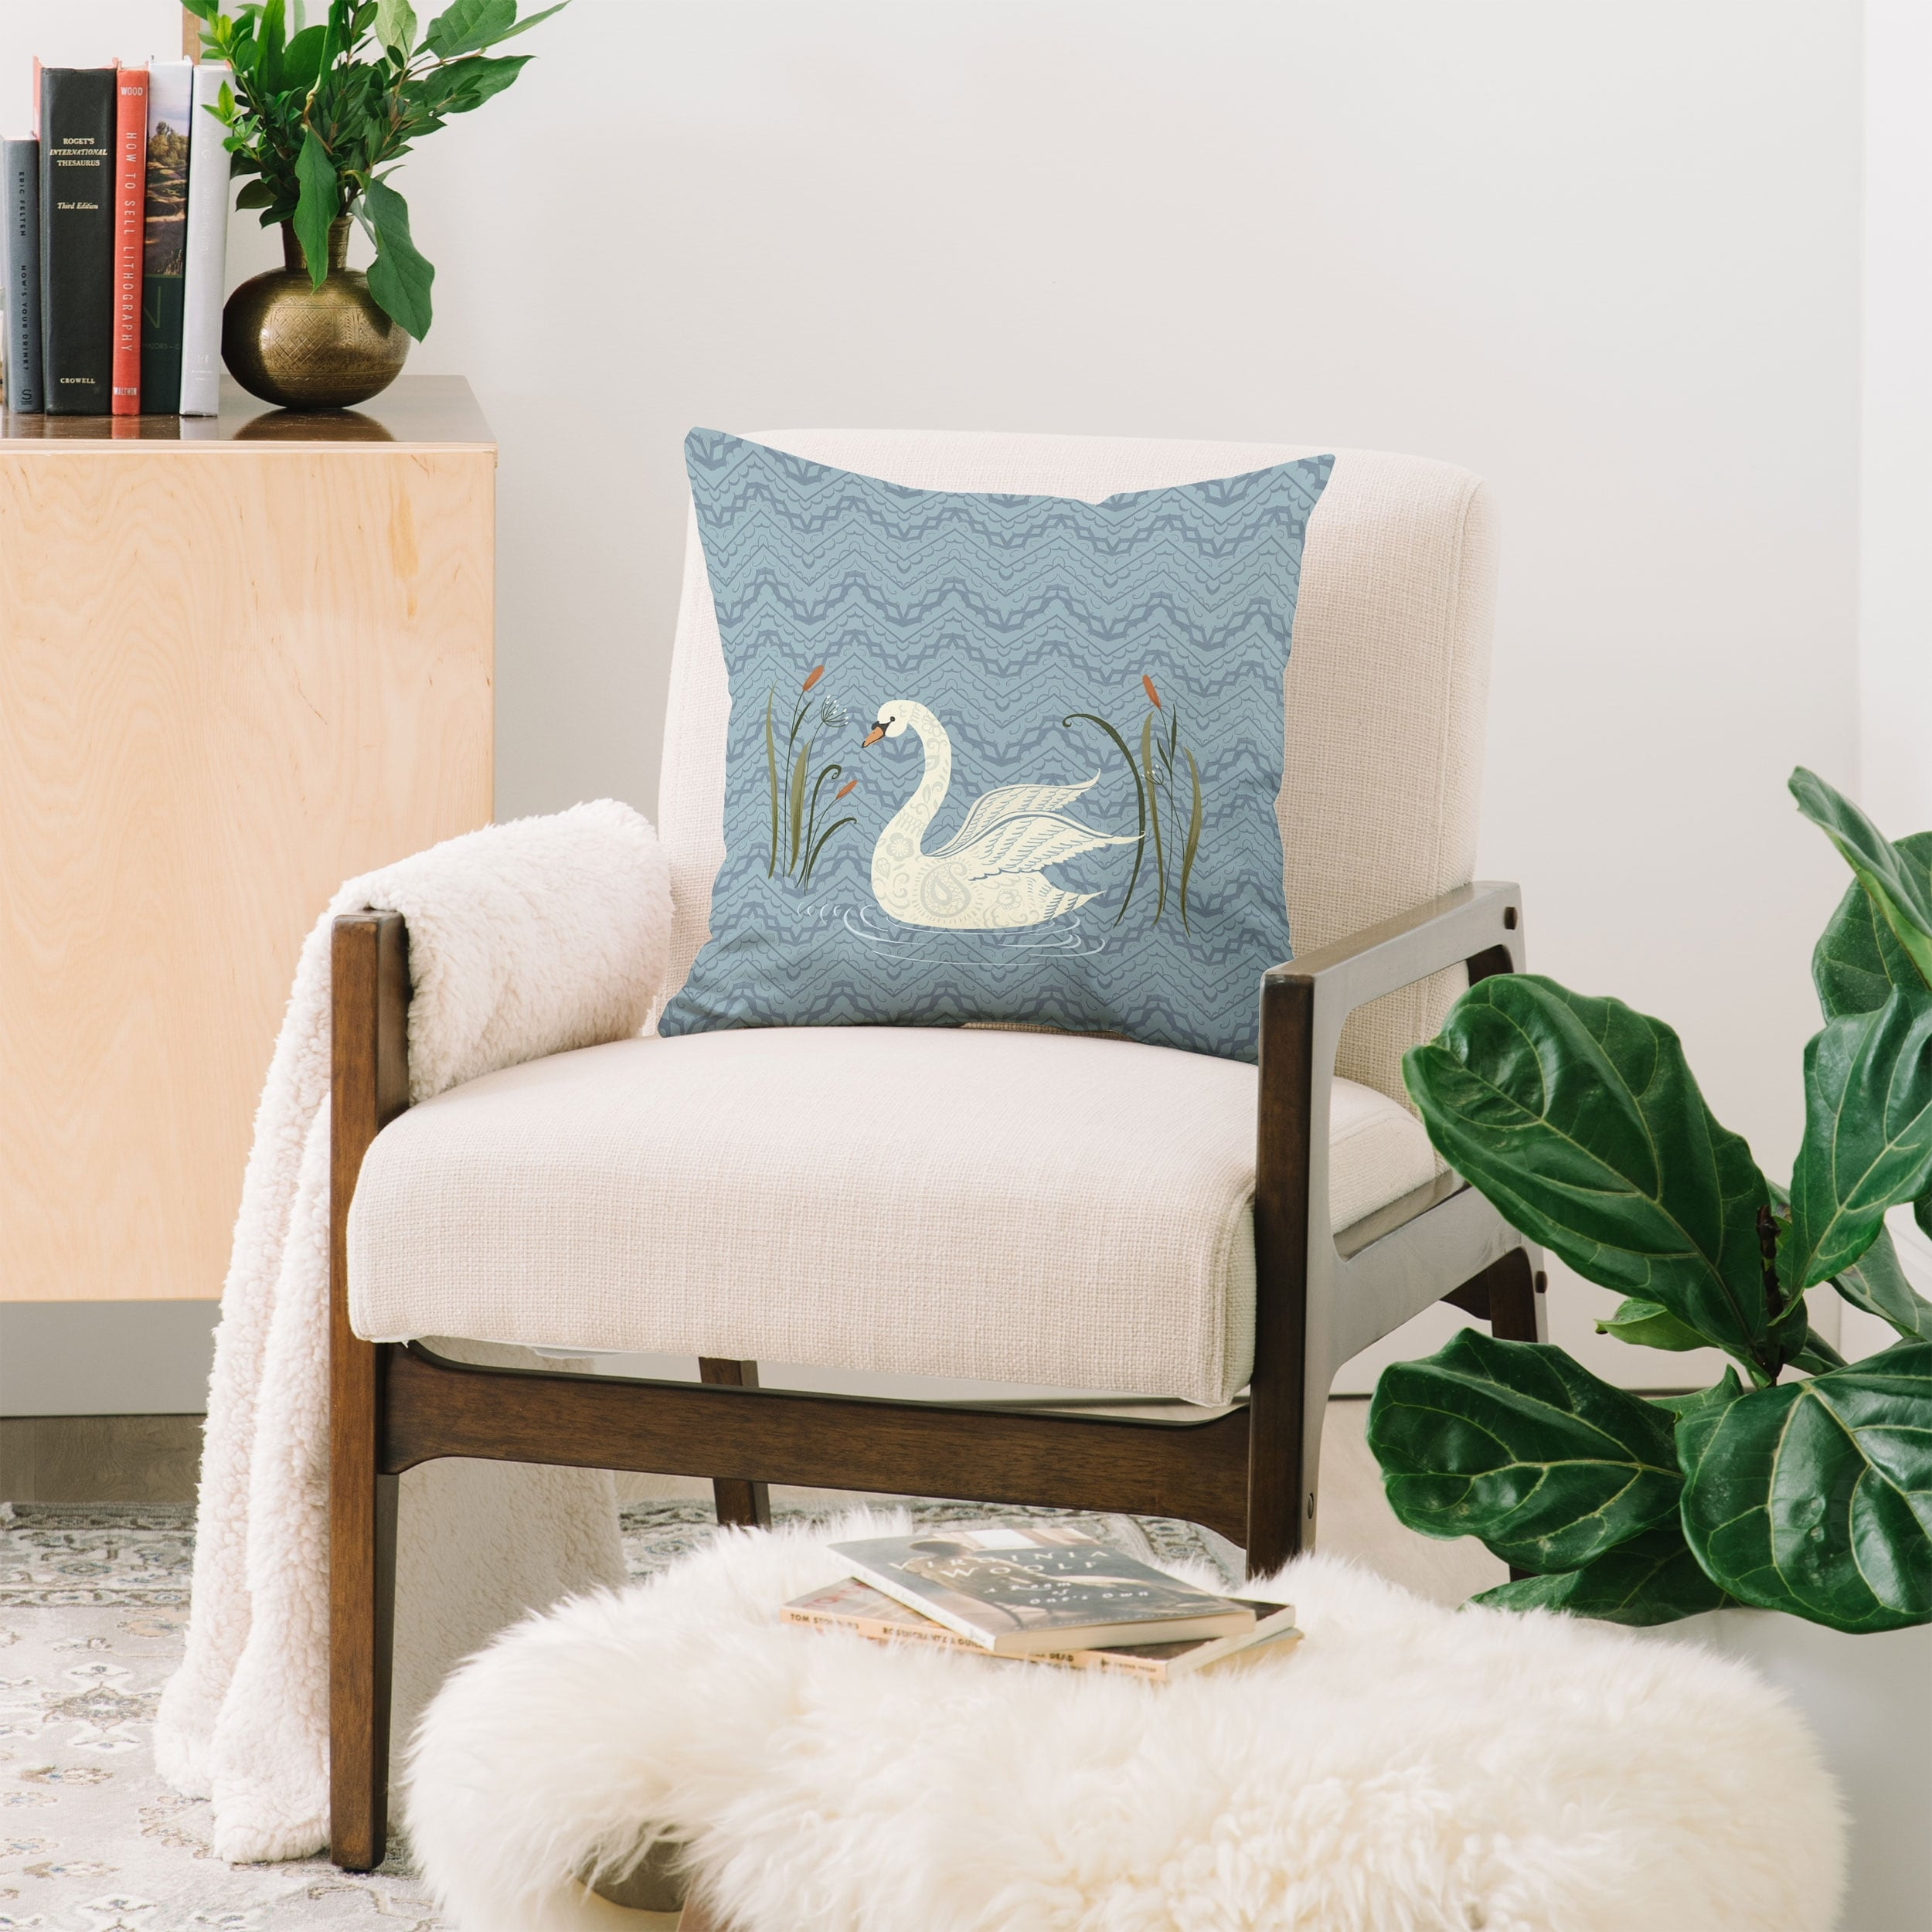 Pimlada Phuapradit Winter Swan Throw Pillow Overstock 14606735